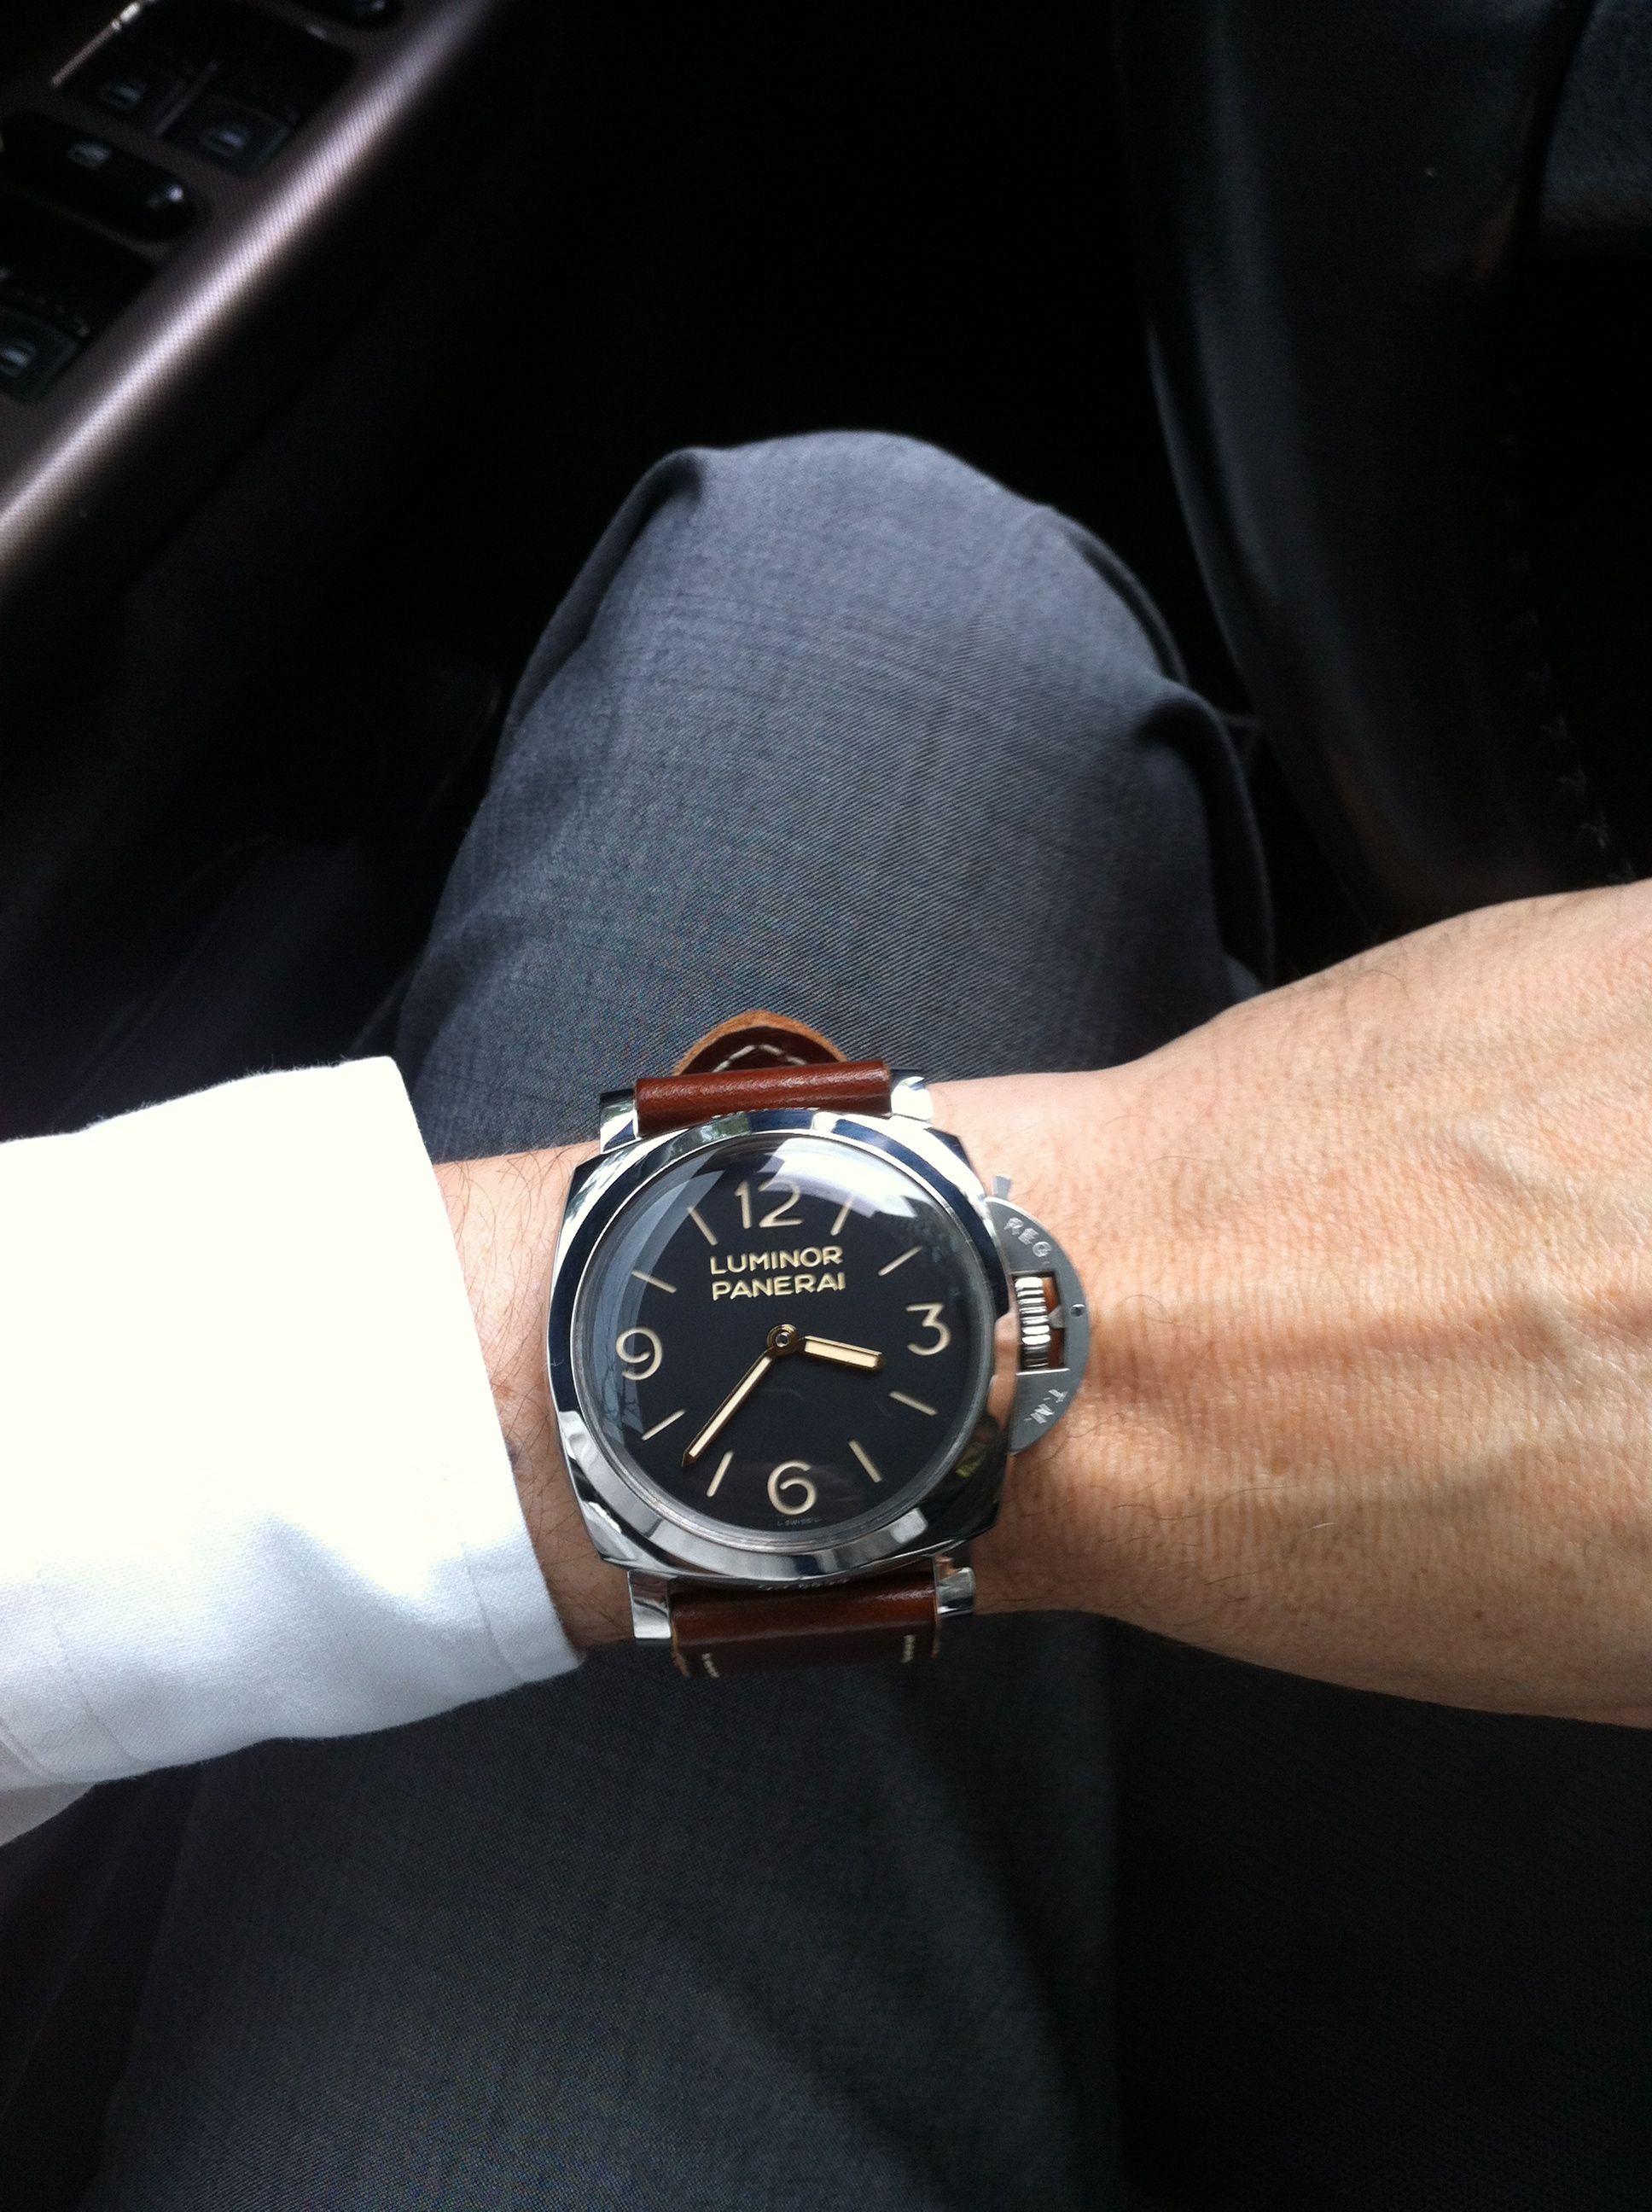 372 Panerai, Paul Smith Slacks, OEM watch strap | Panerai ...